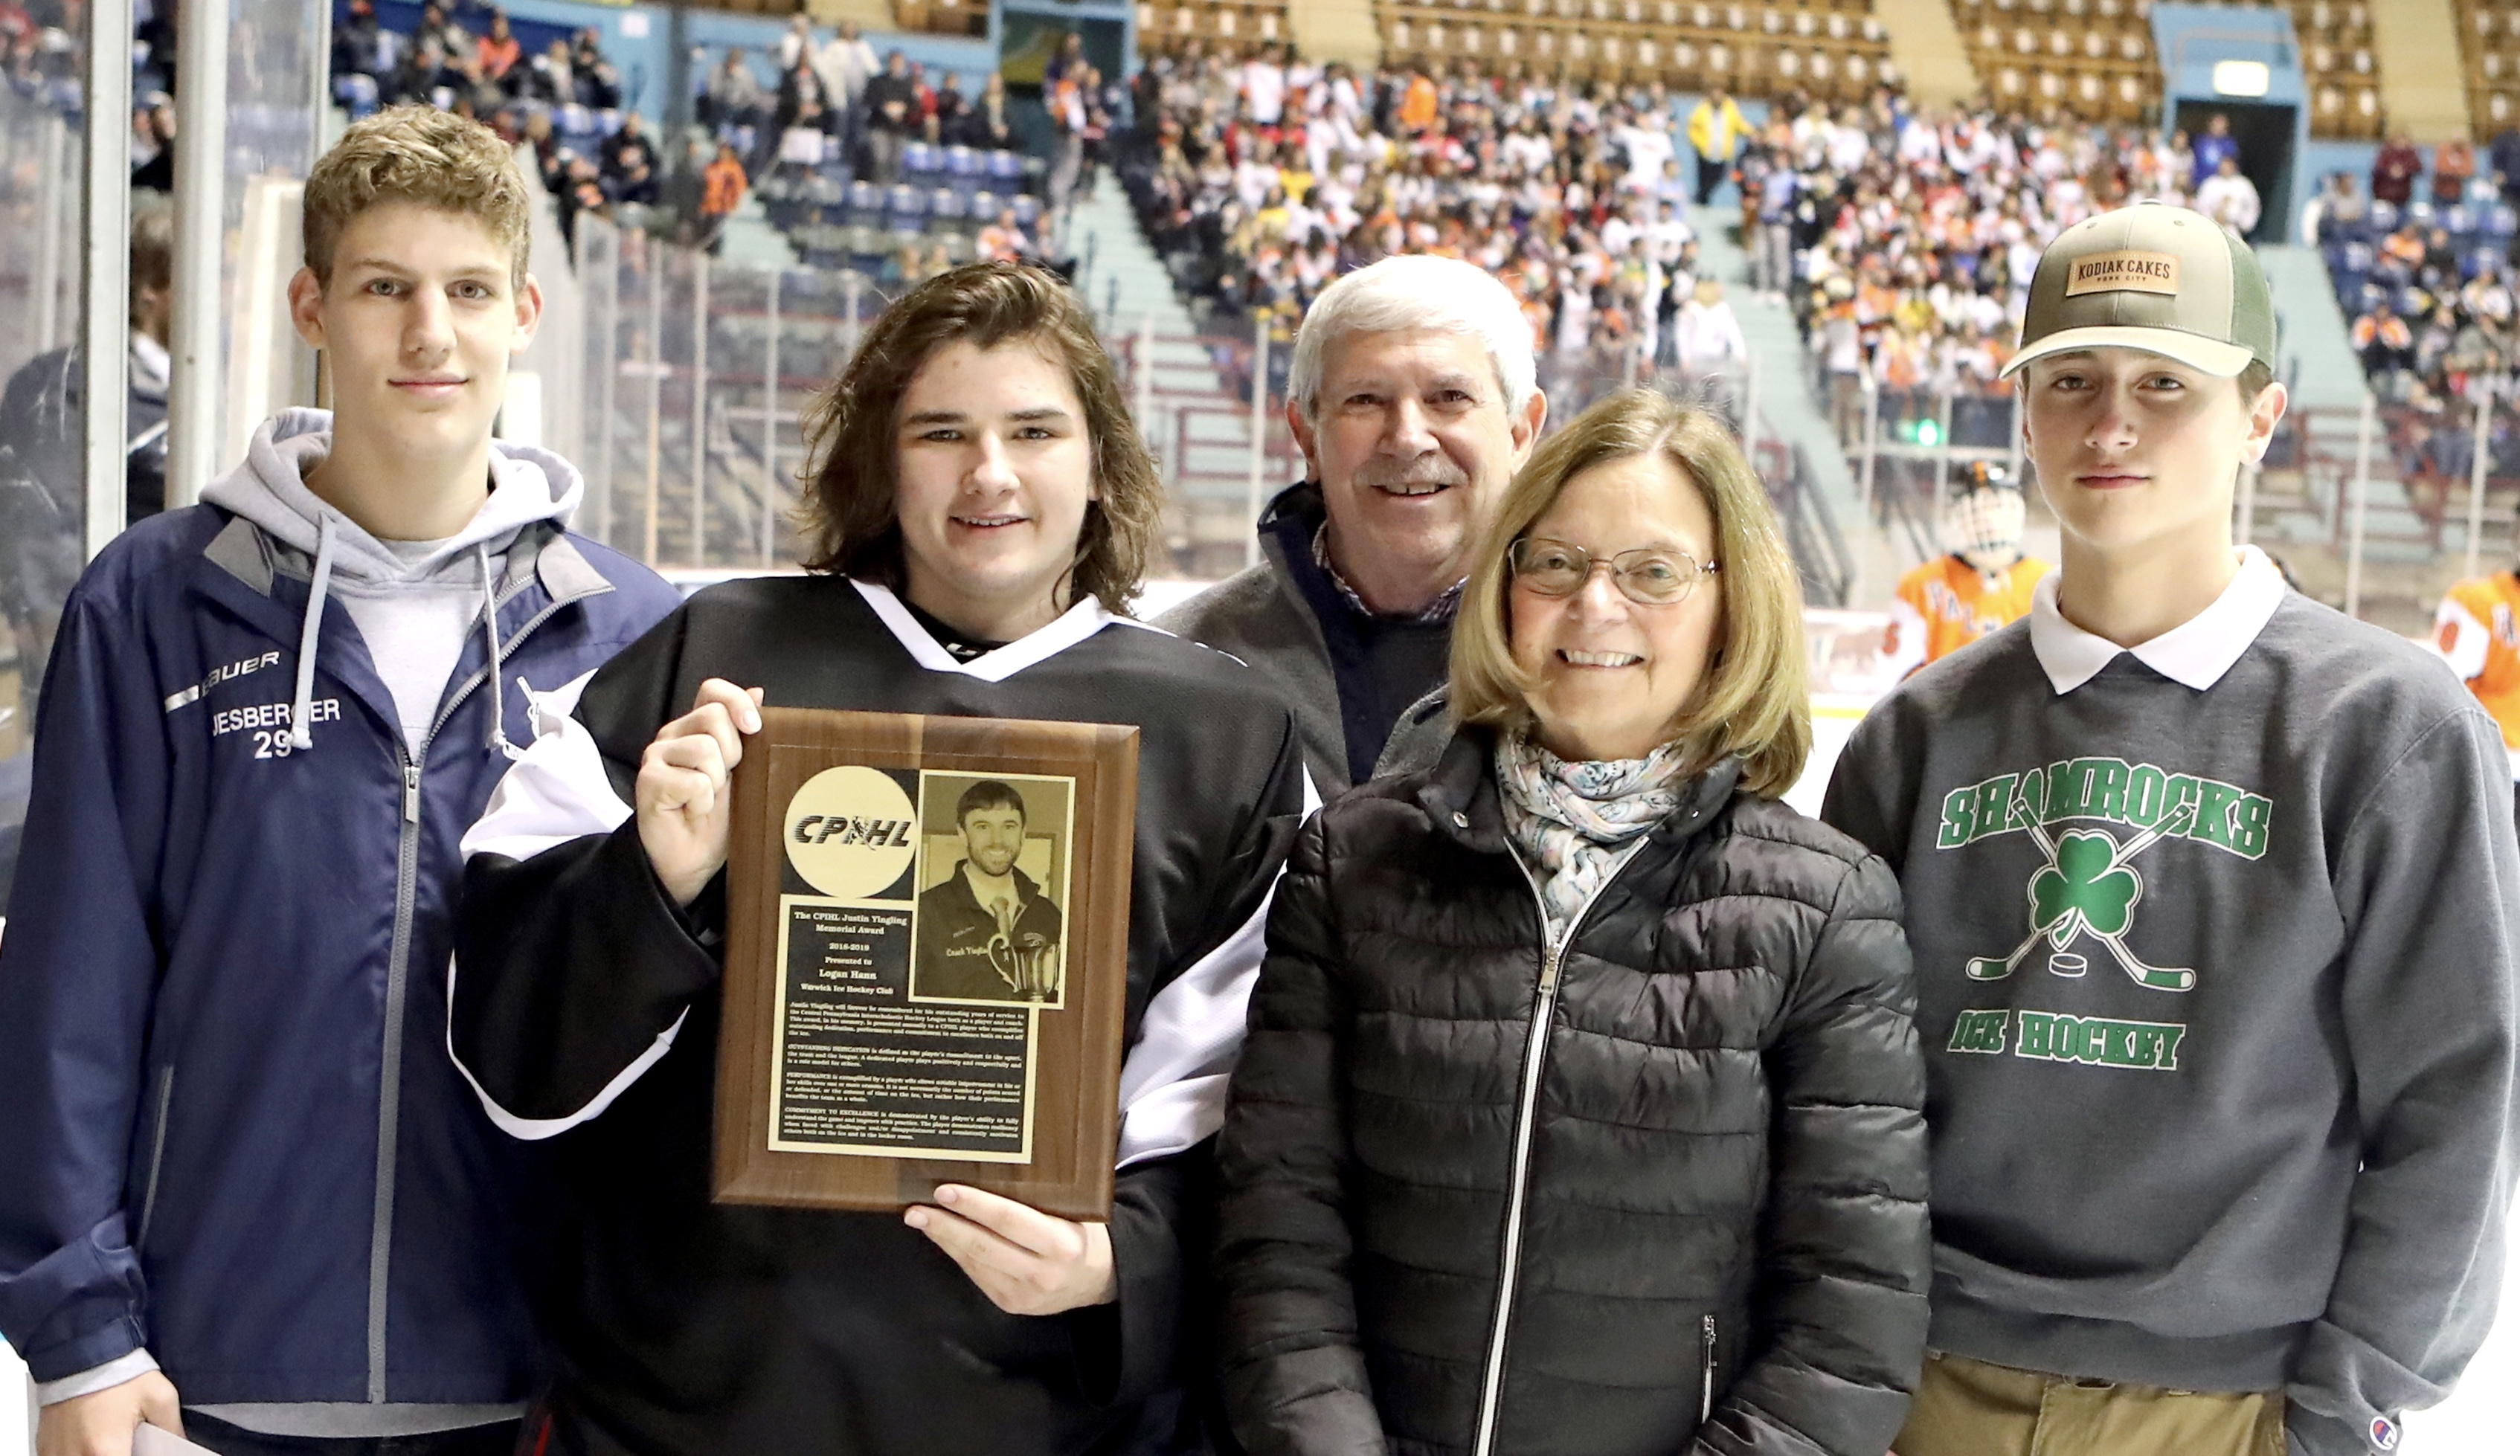 Central Pennsylvania Interscholastic Hockey League